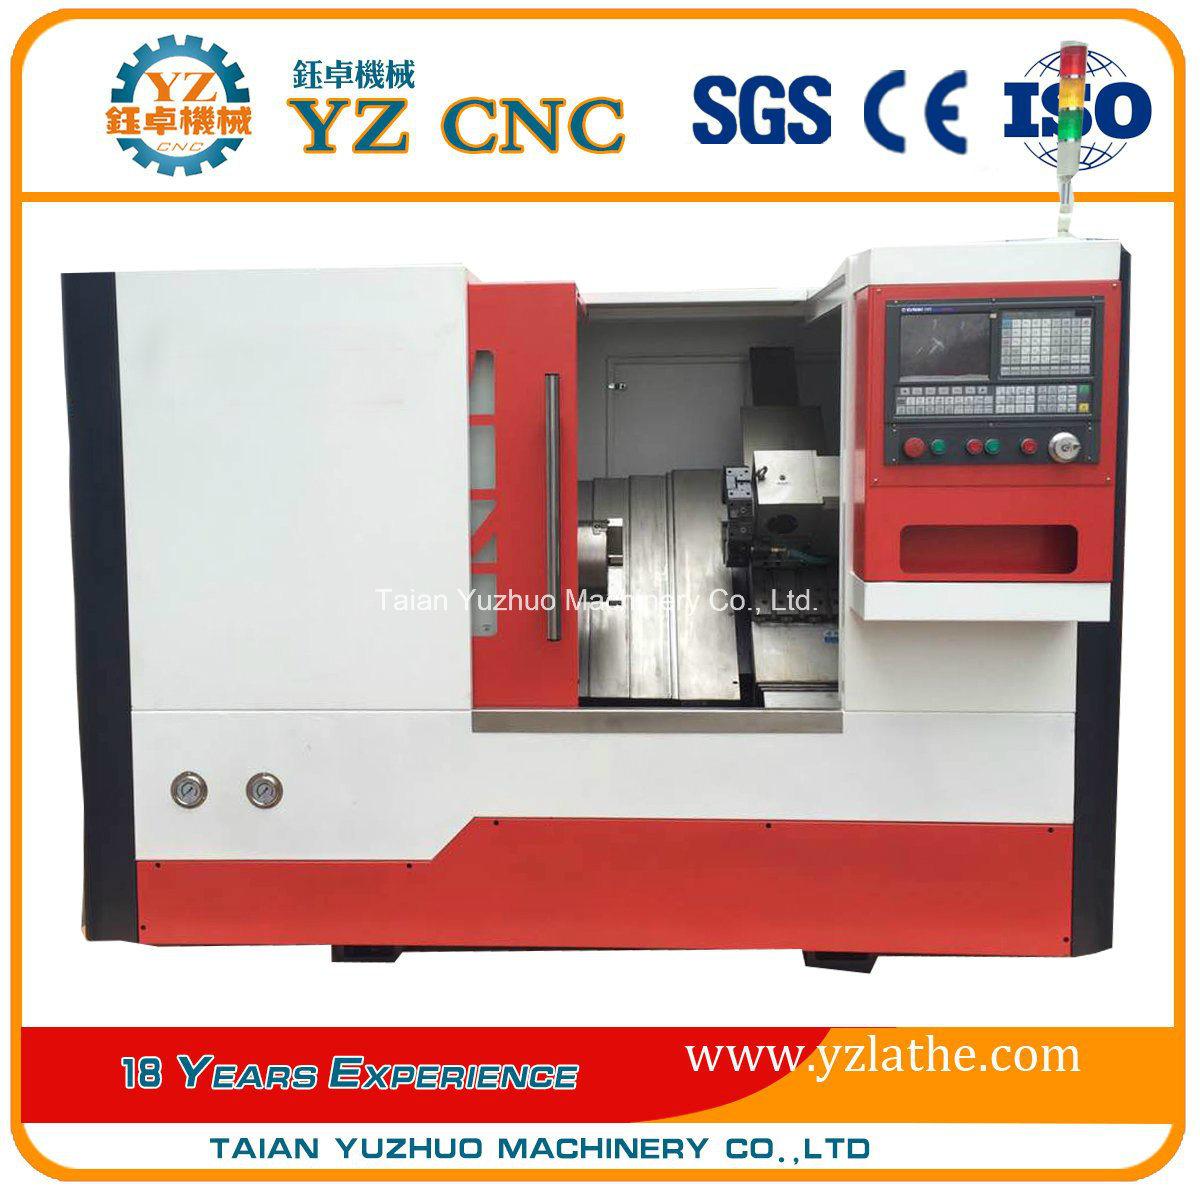 High Speed Taiwan Technology Slant Bed CNC Lathe